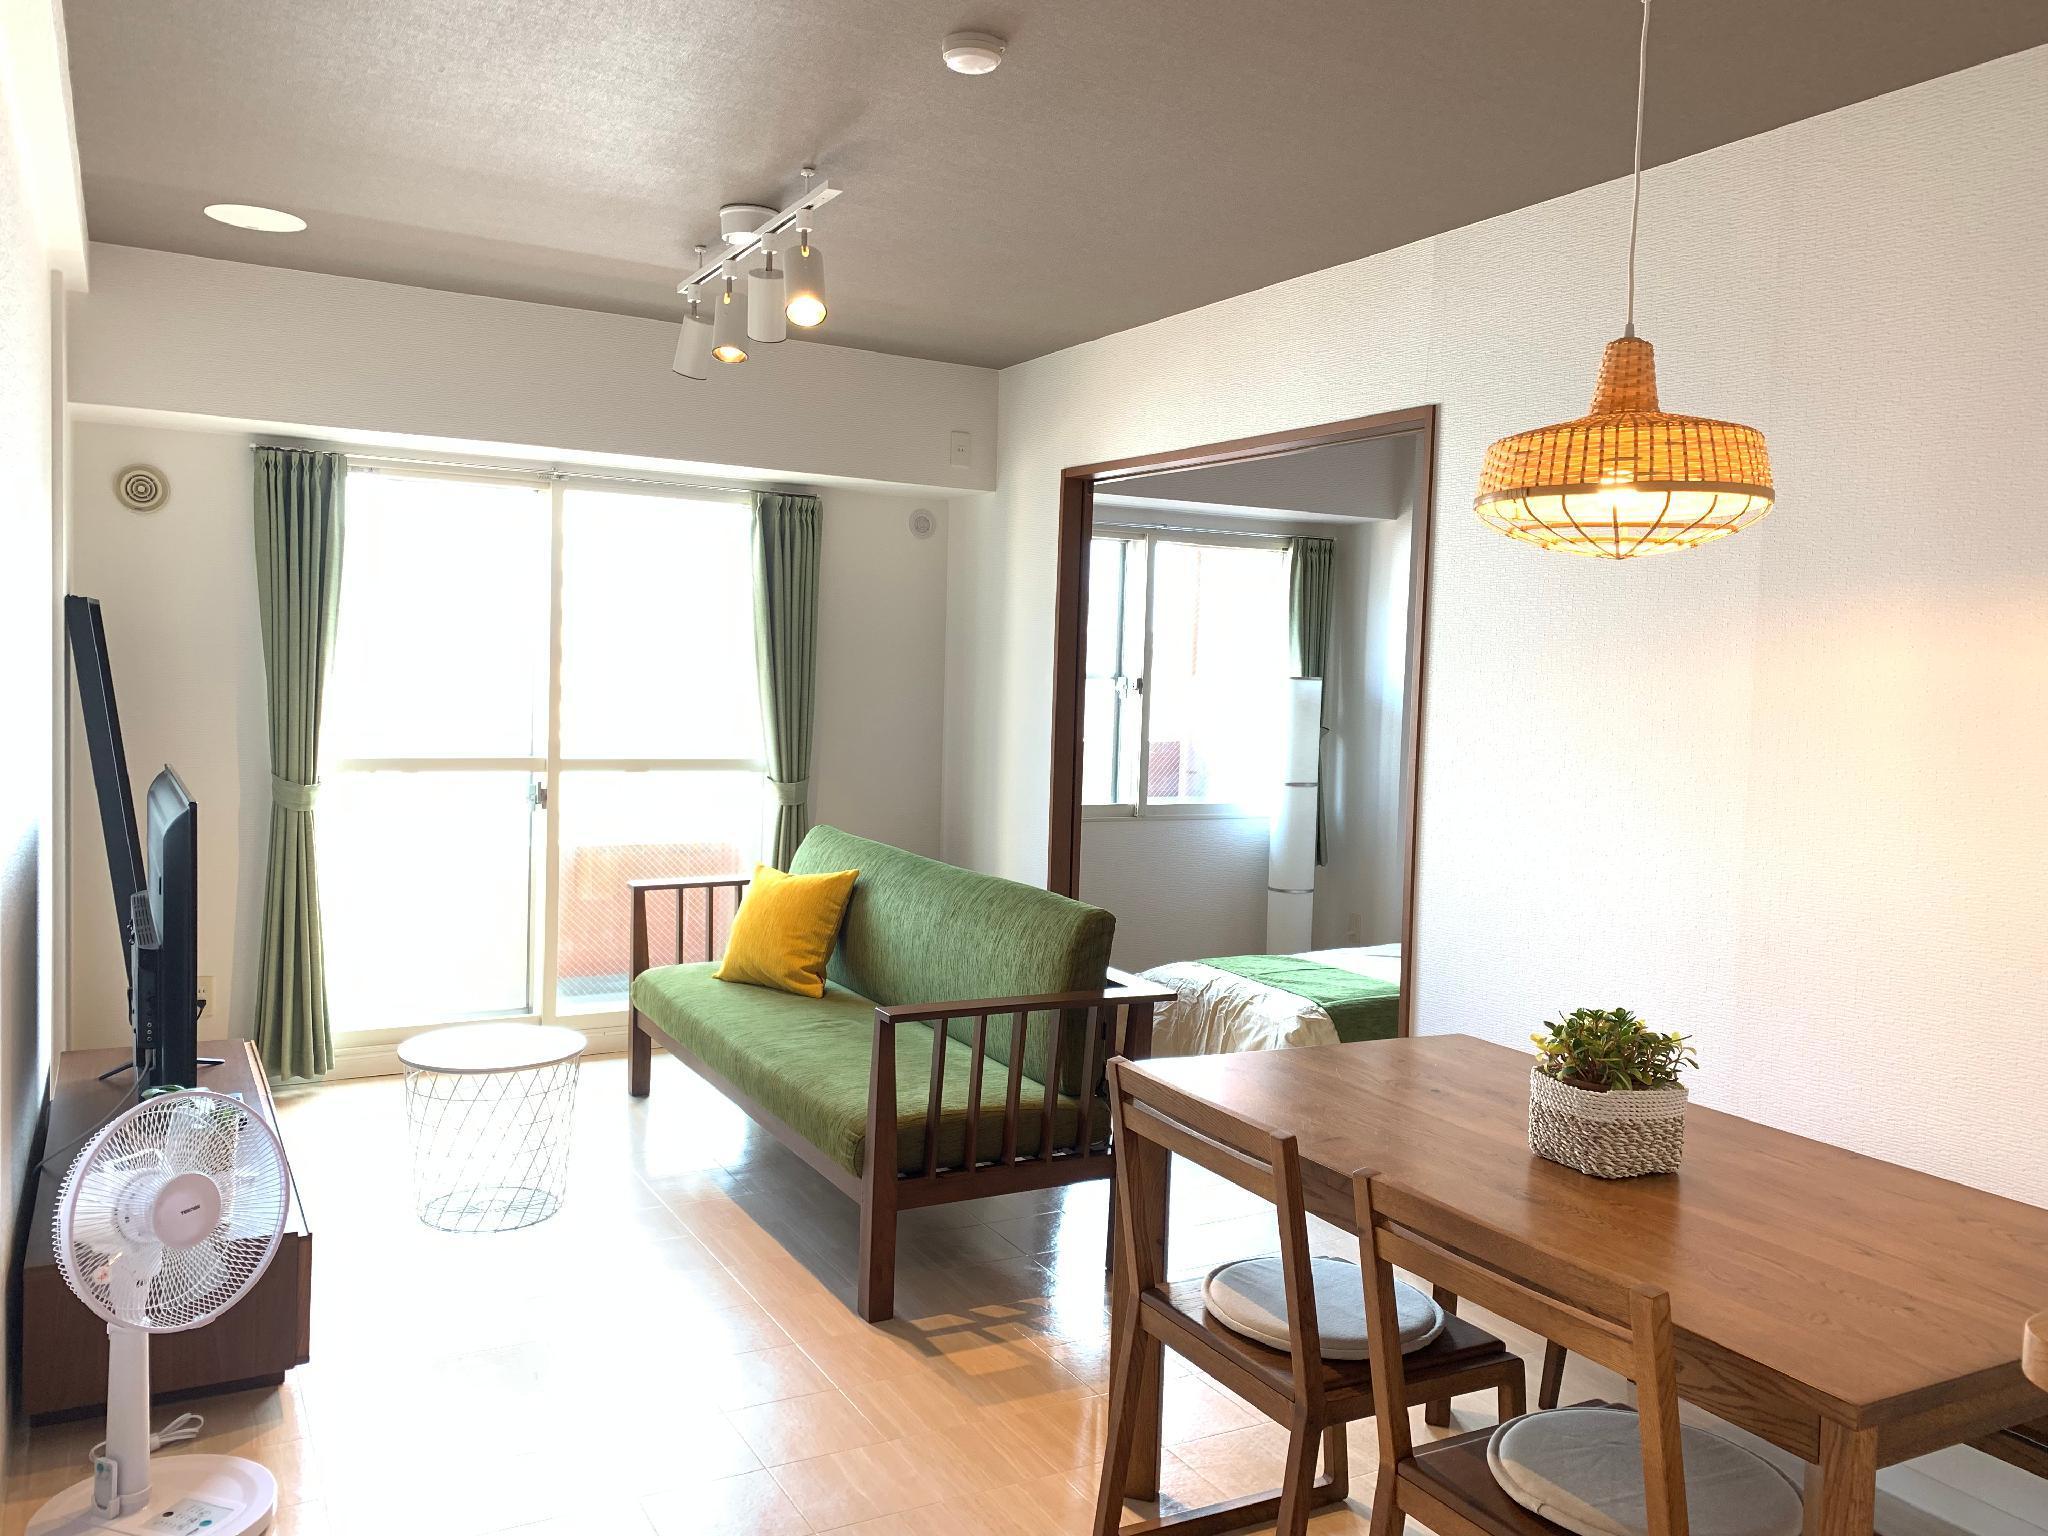 S4 57 1 Bedroom Apartment In Sapporo